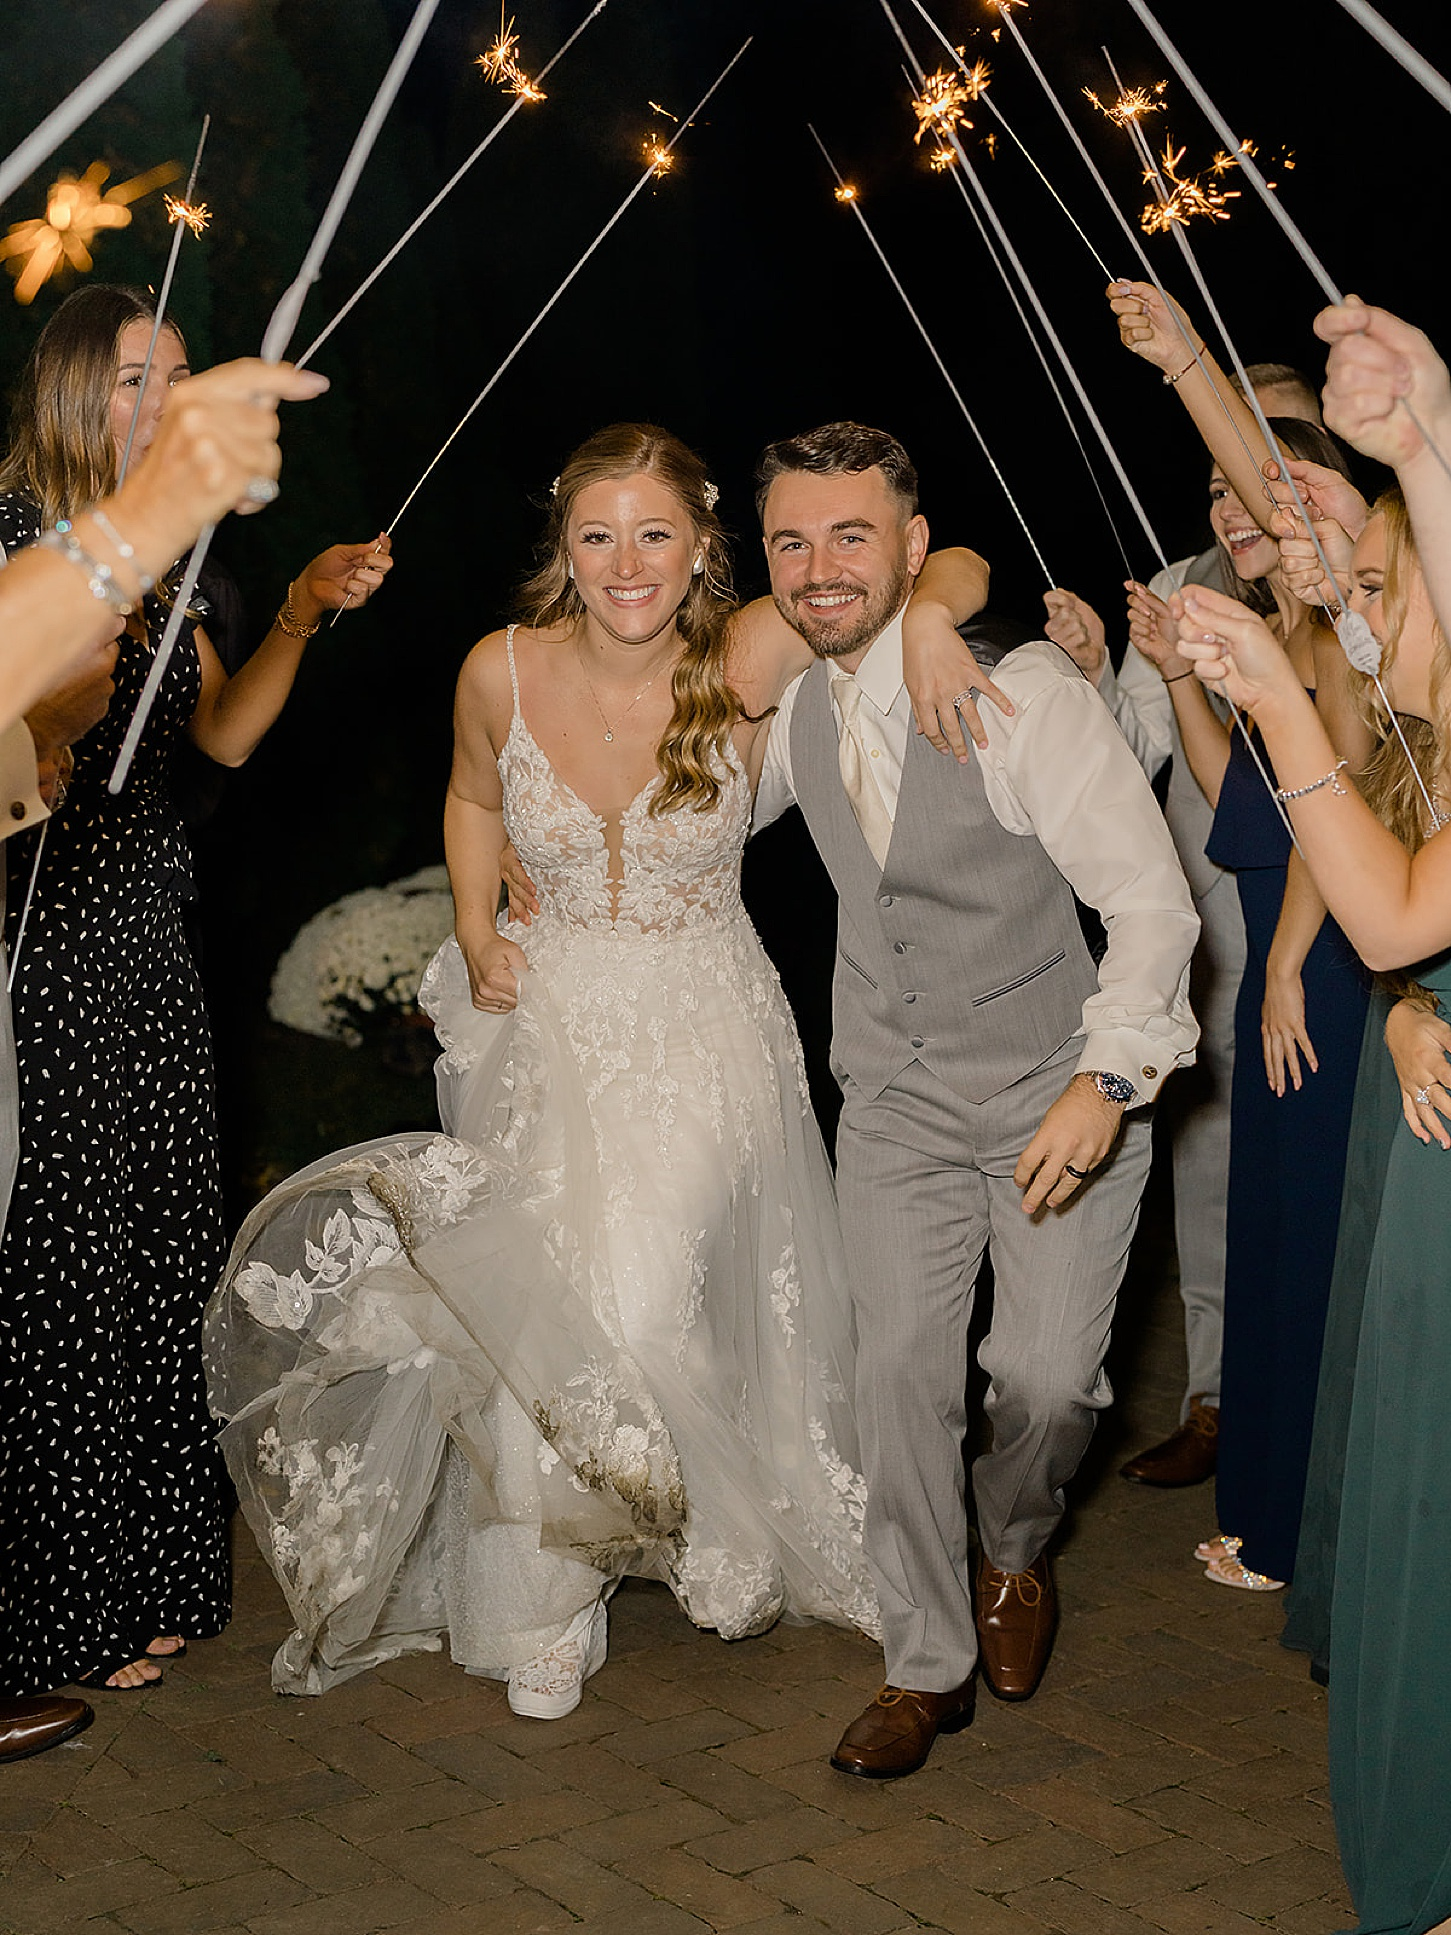 Valenzano Winery Vitners Pavillion Wedding Photography by Magdalena Studios 0046